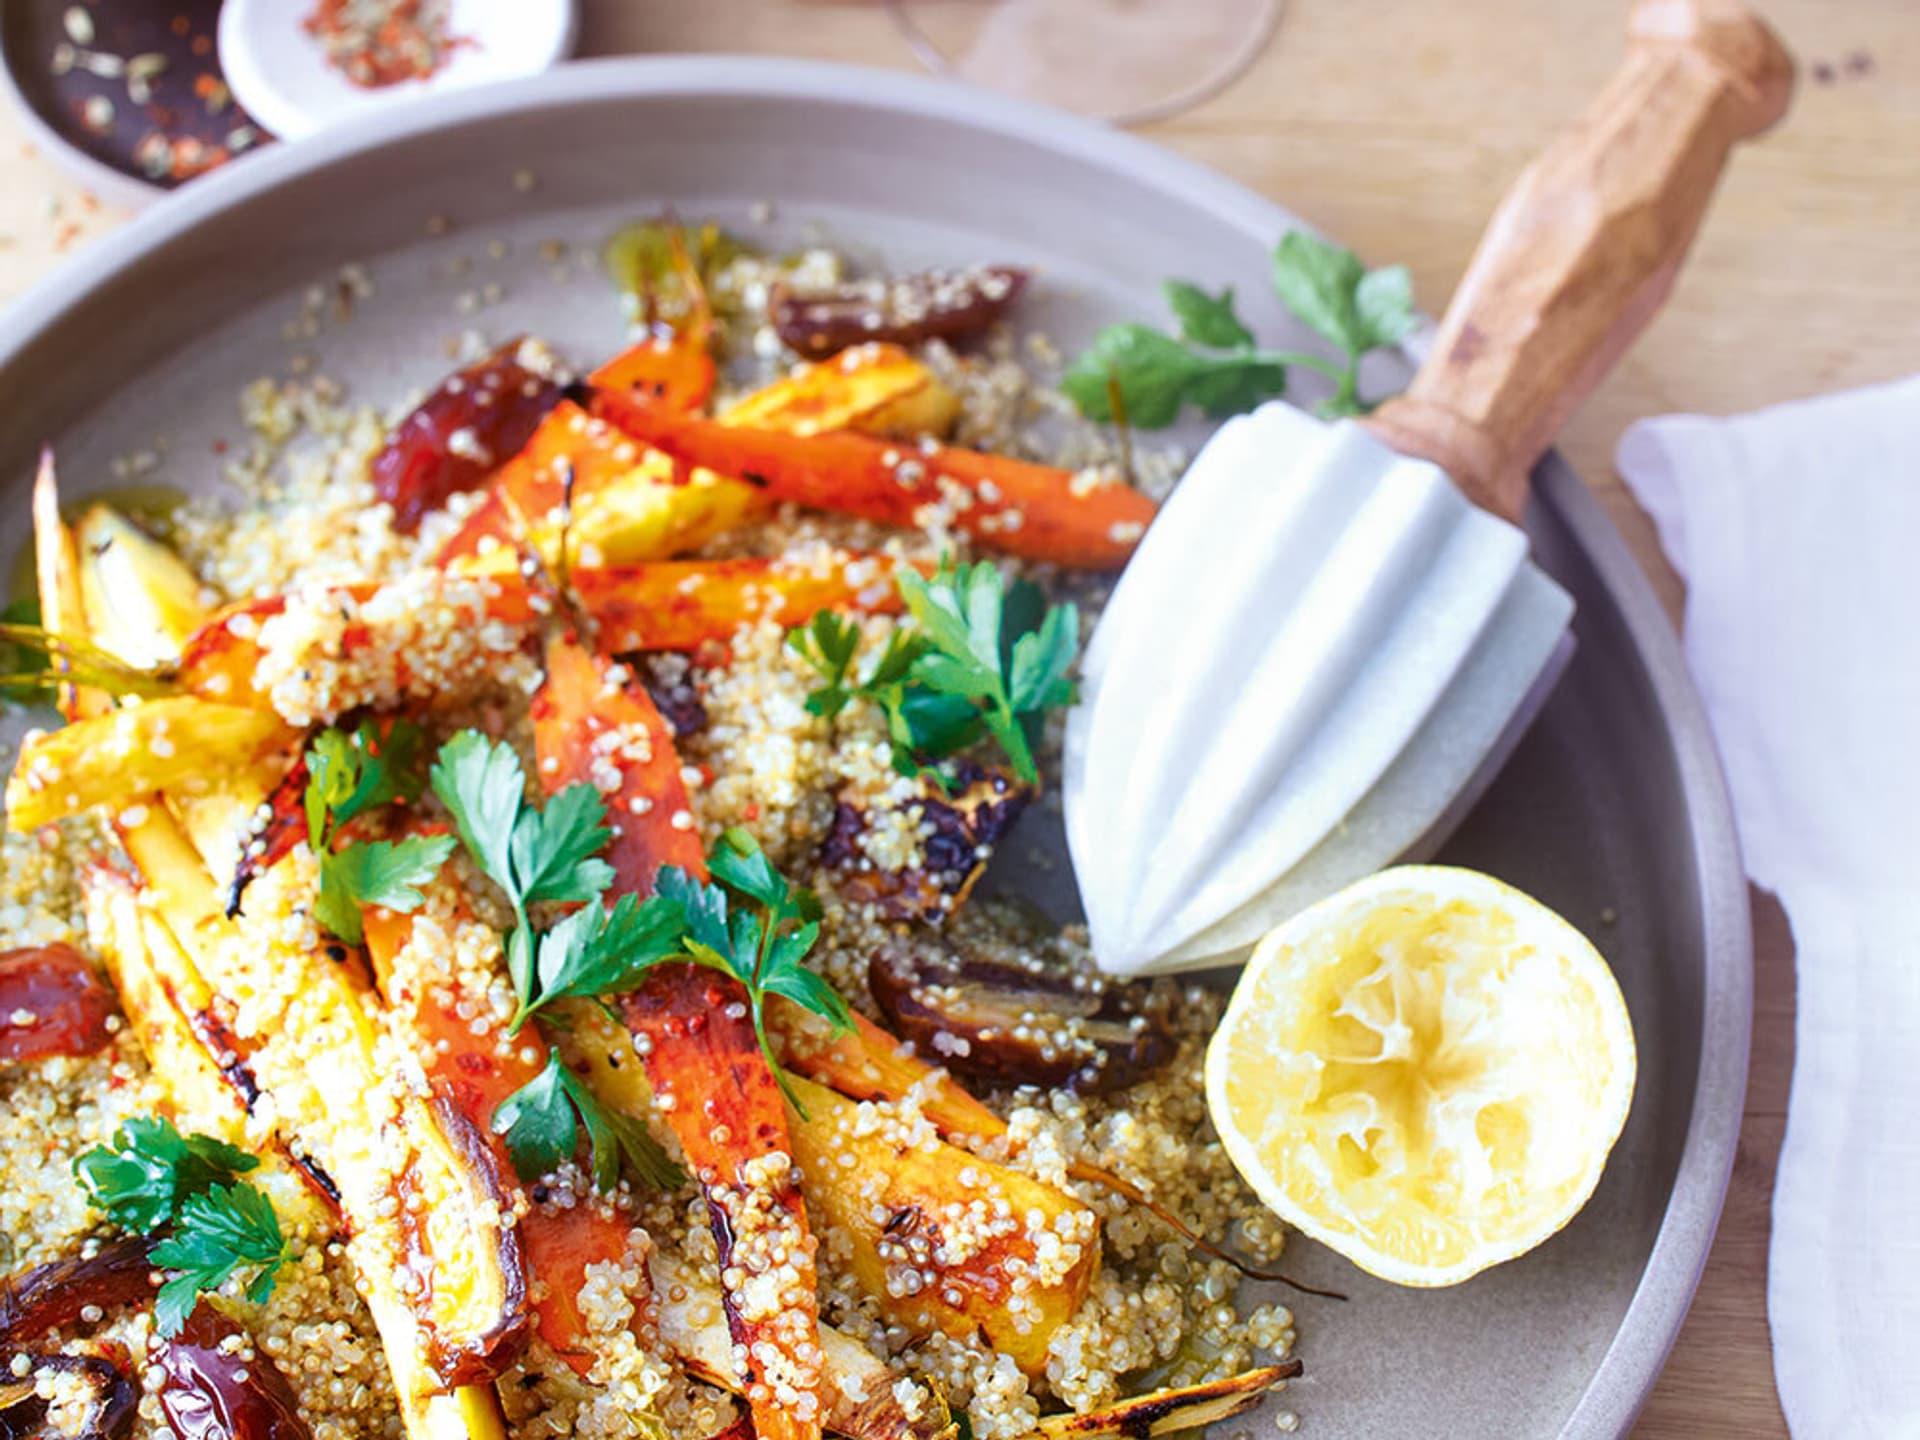 Quinoasalat mit Röstgemüse